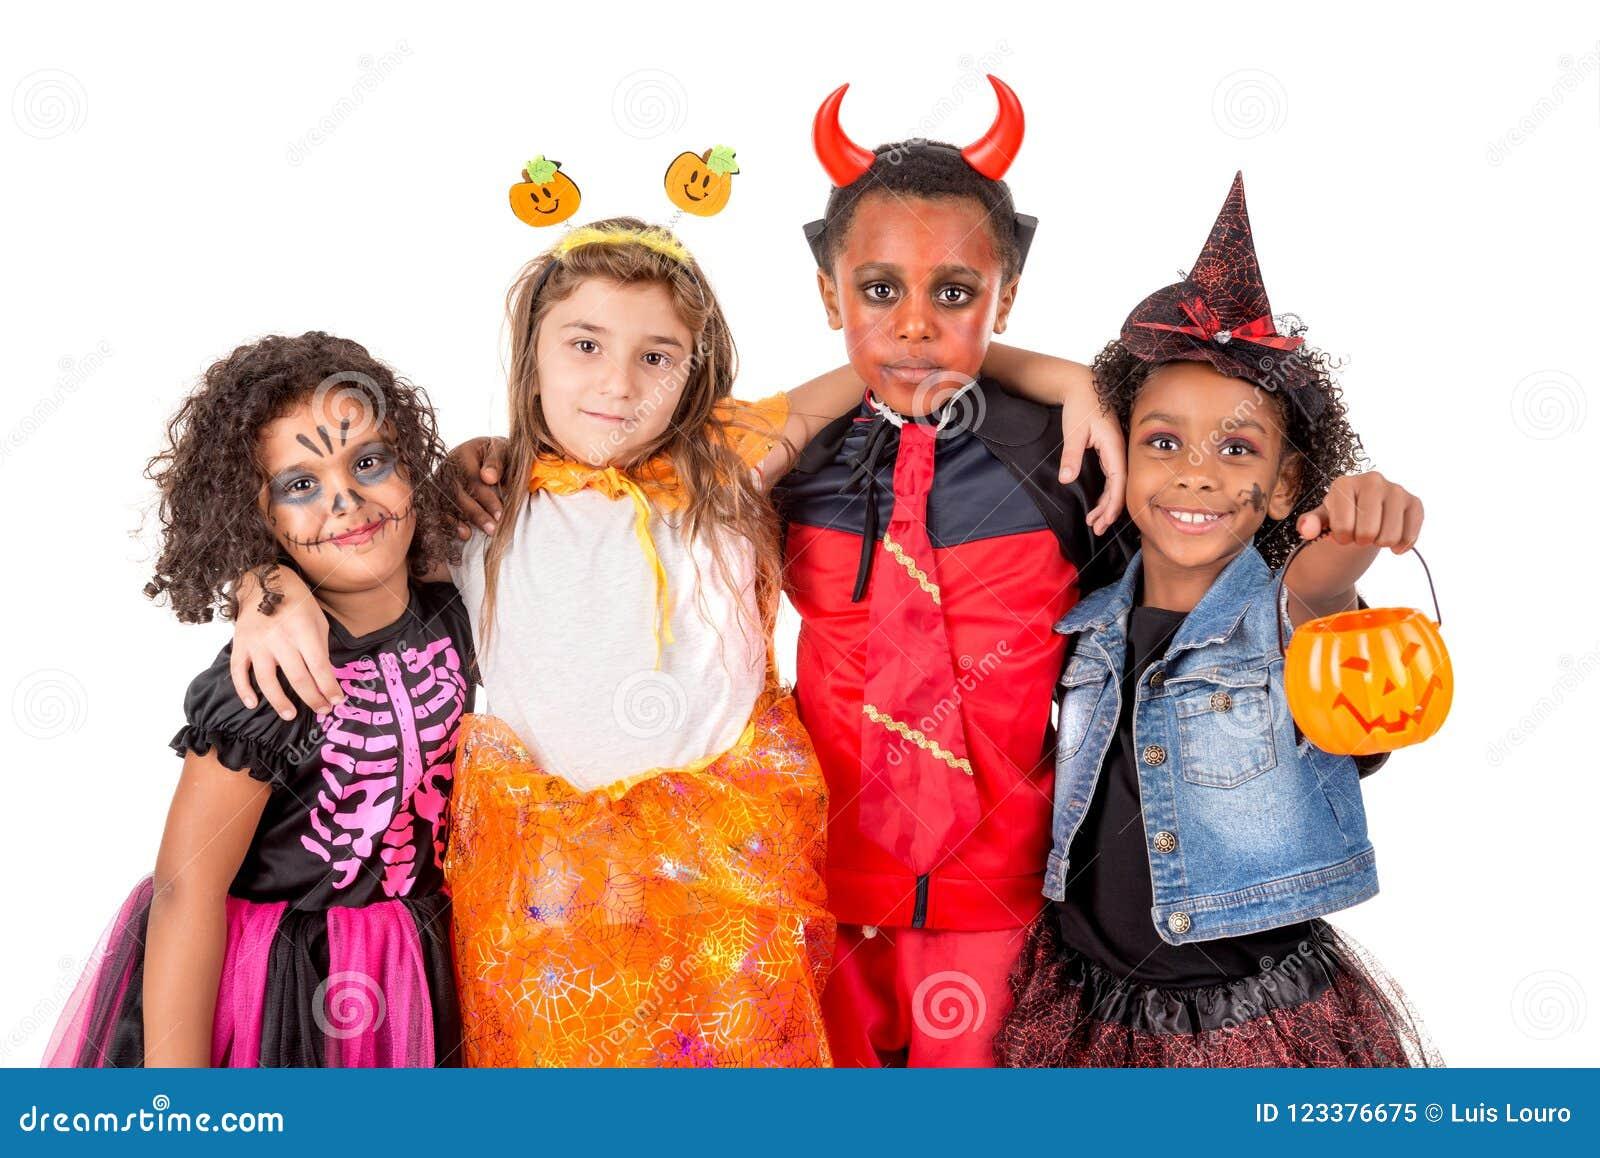 Costumi Halloween Di Gruppo.Gruppo Di Bambini In Costumi Di Halloween Immagine Stock Immagine